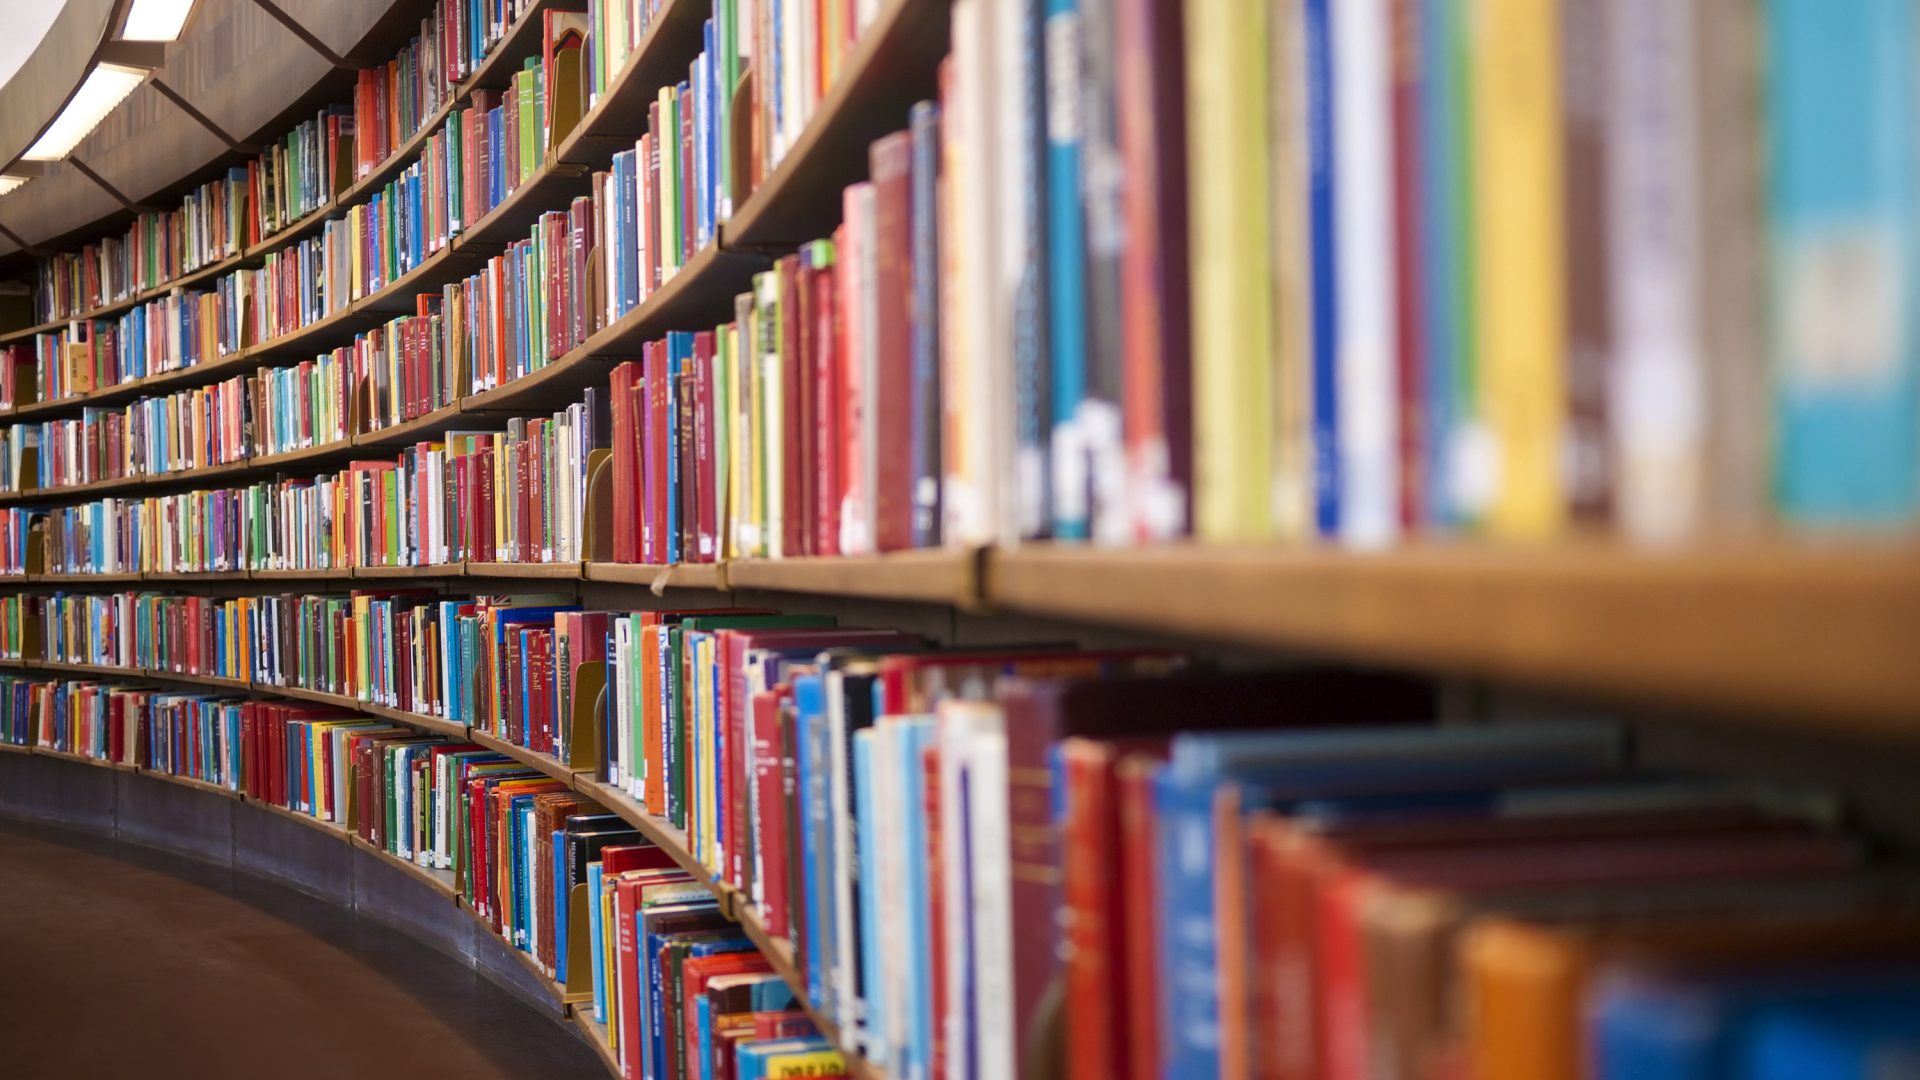 Dinas Perpustakaan dan Kearsipan Aceh